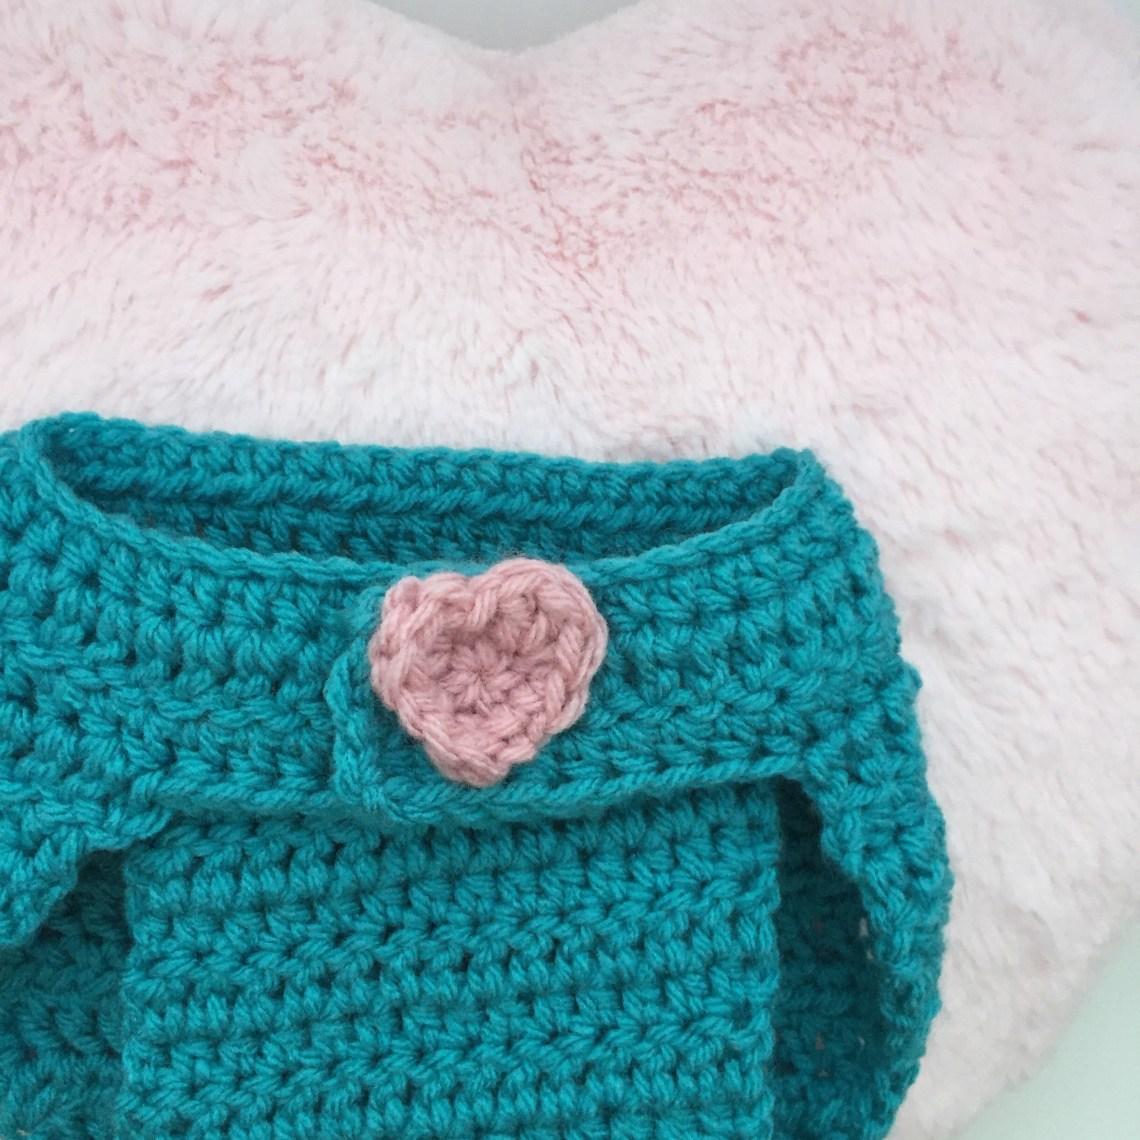 5d2dfedd1 Diaper Cover Crochet Pattern - Shabby Sheep Apparel